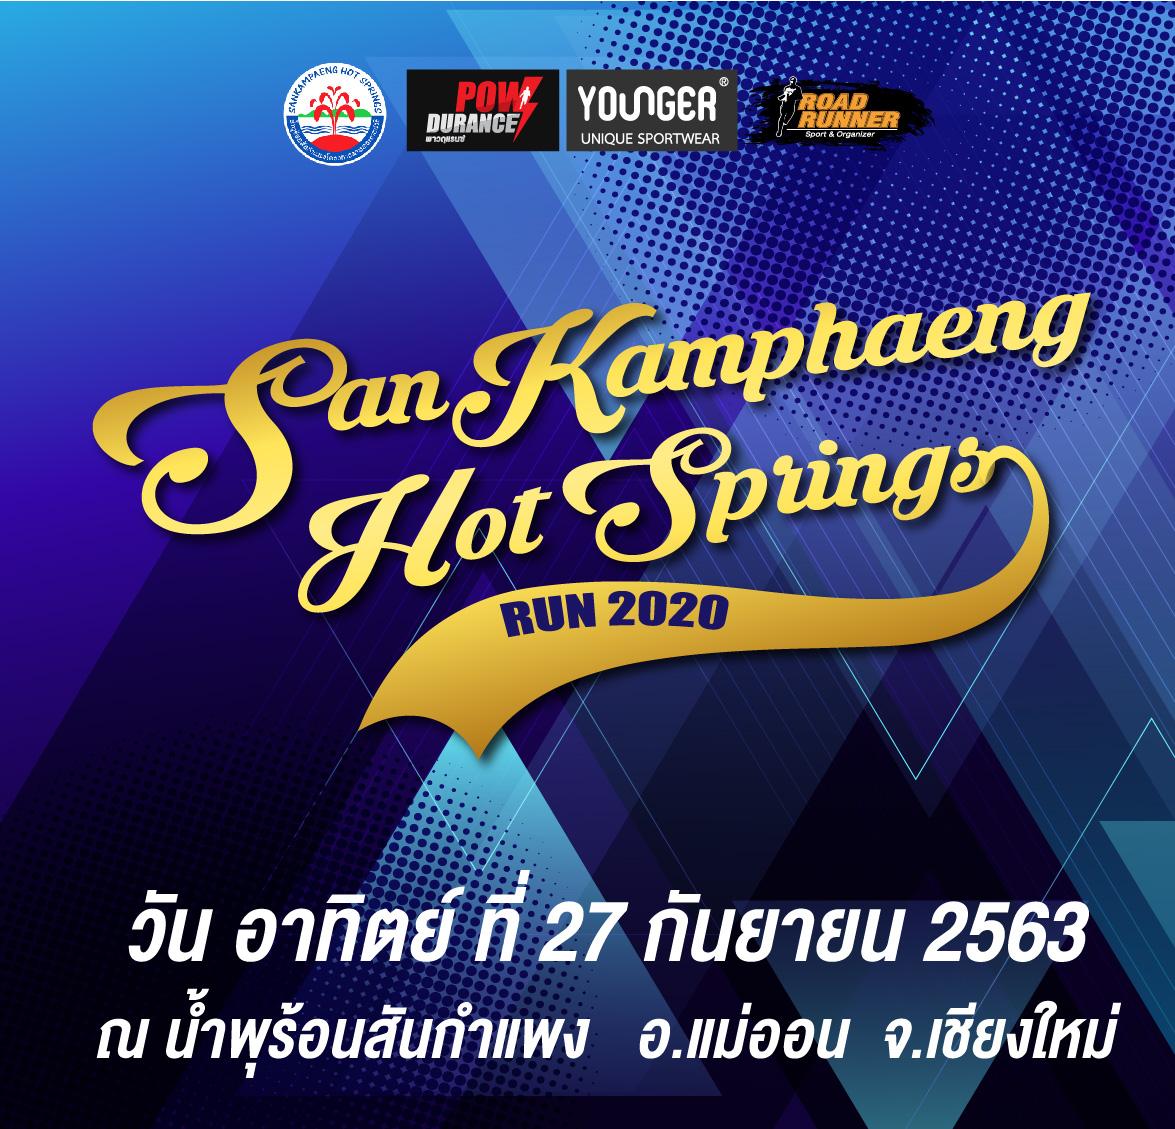 SanKamphaeng Hotspring Run 2020